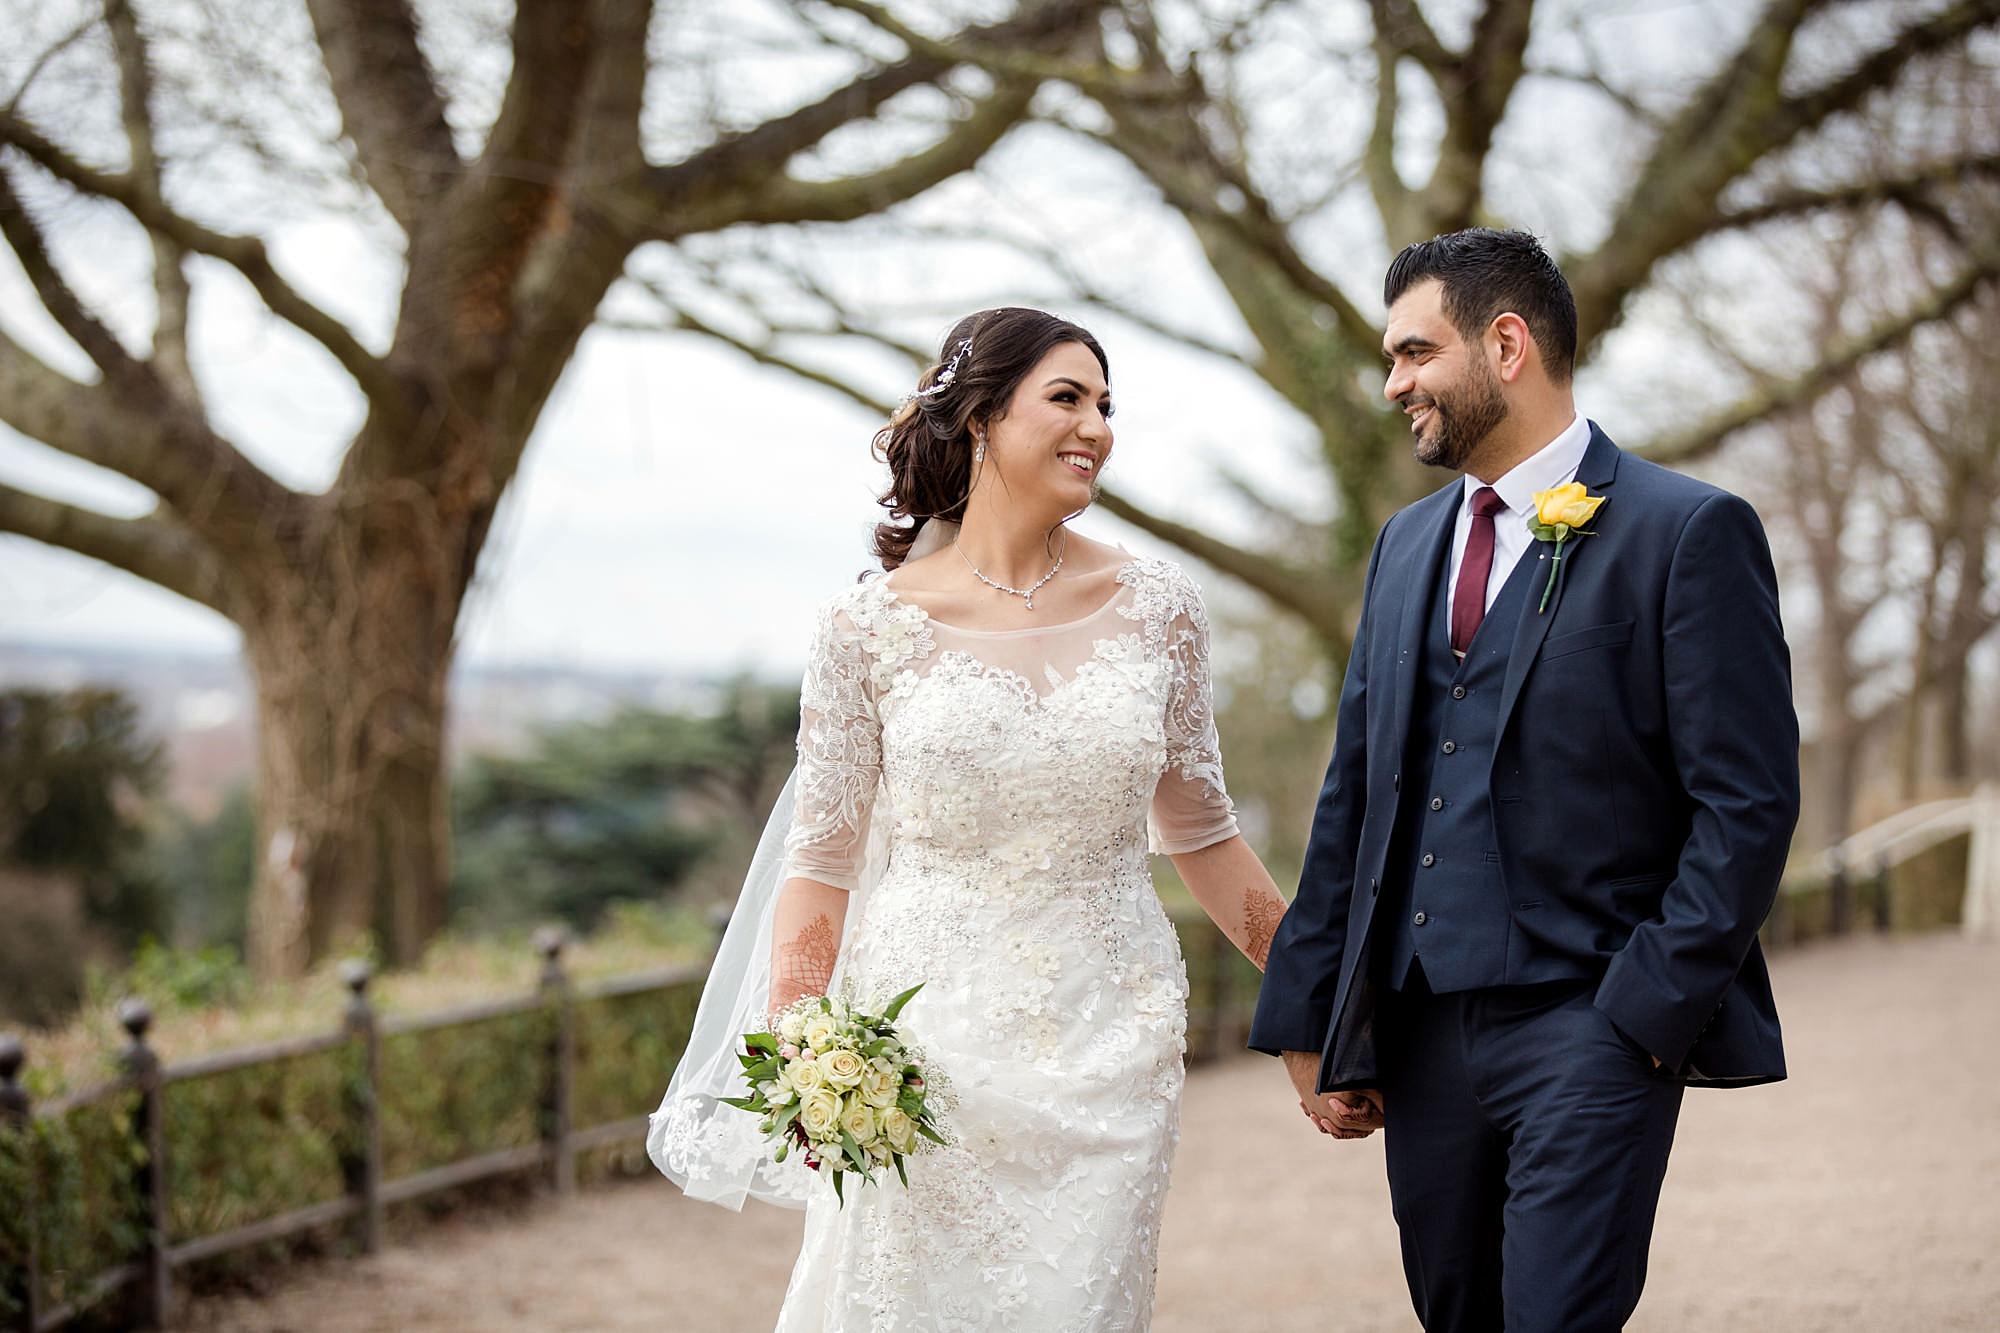 Richmond Hill Hotel wedding groom and bride walking together